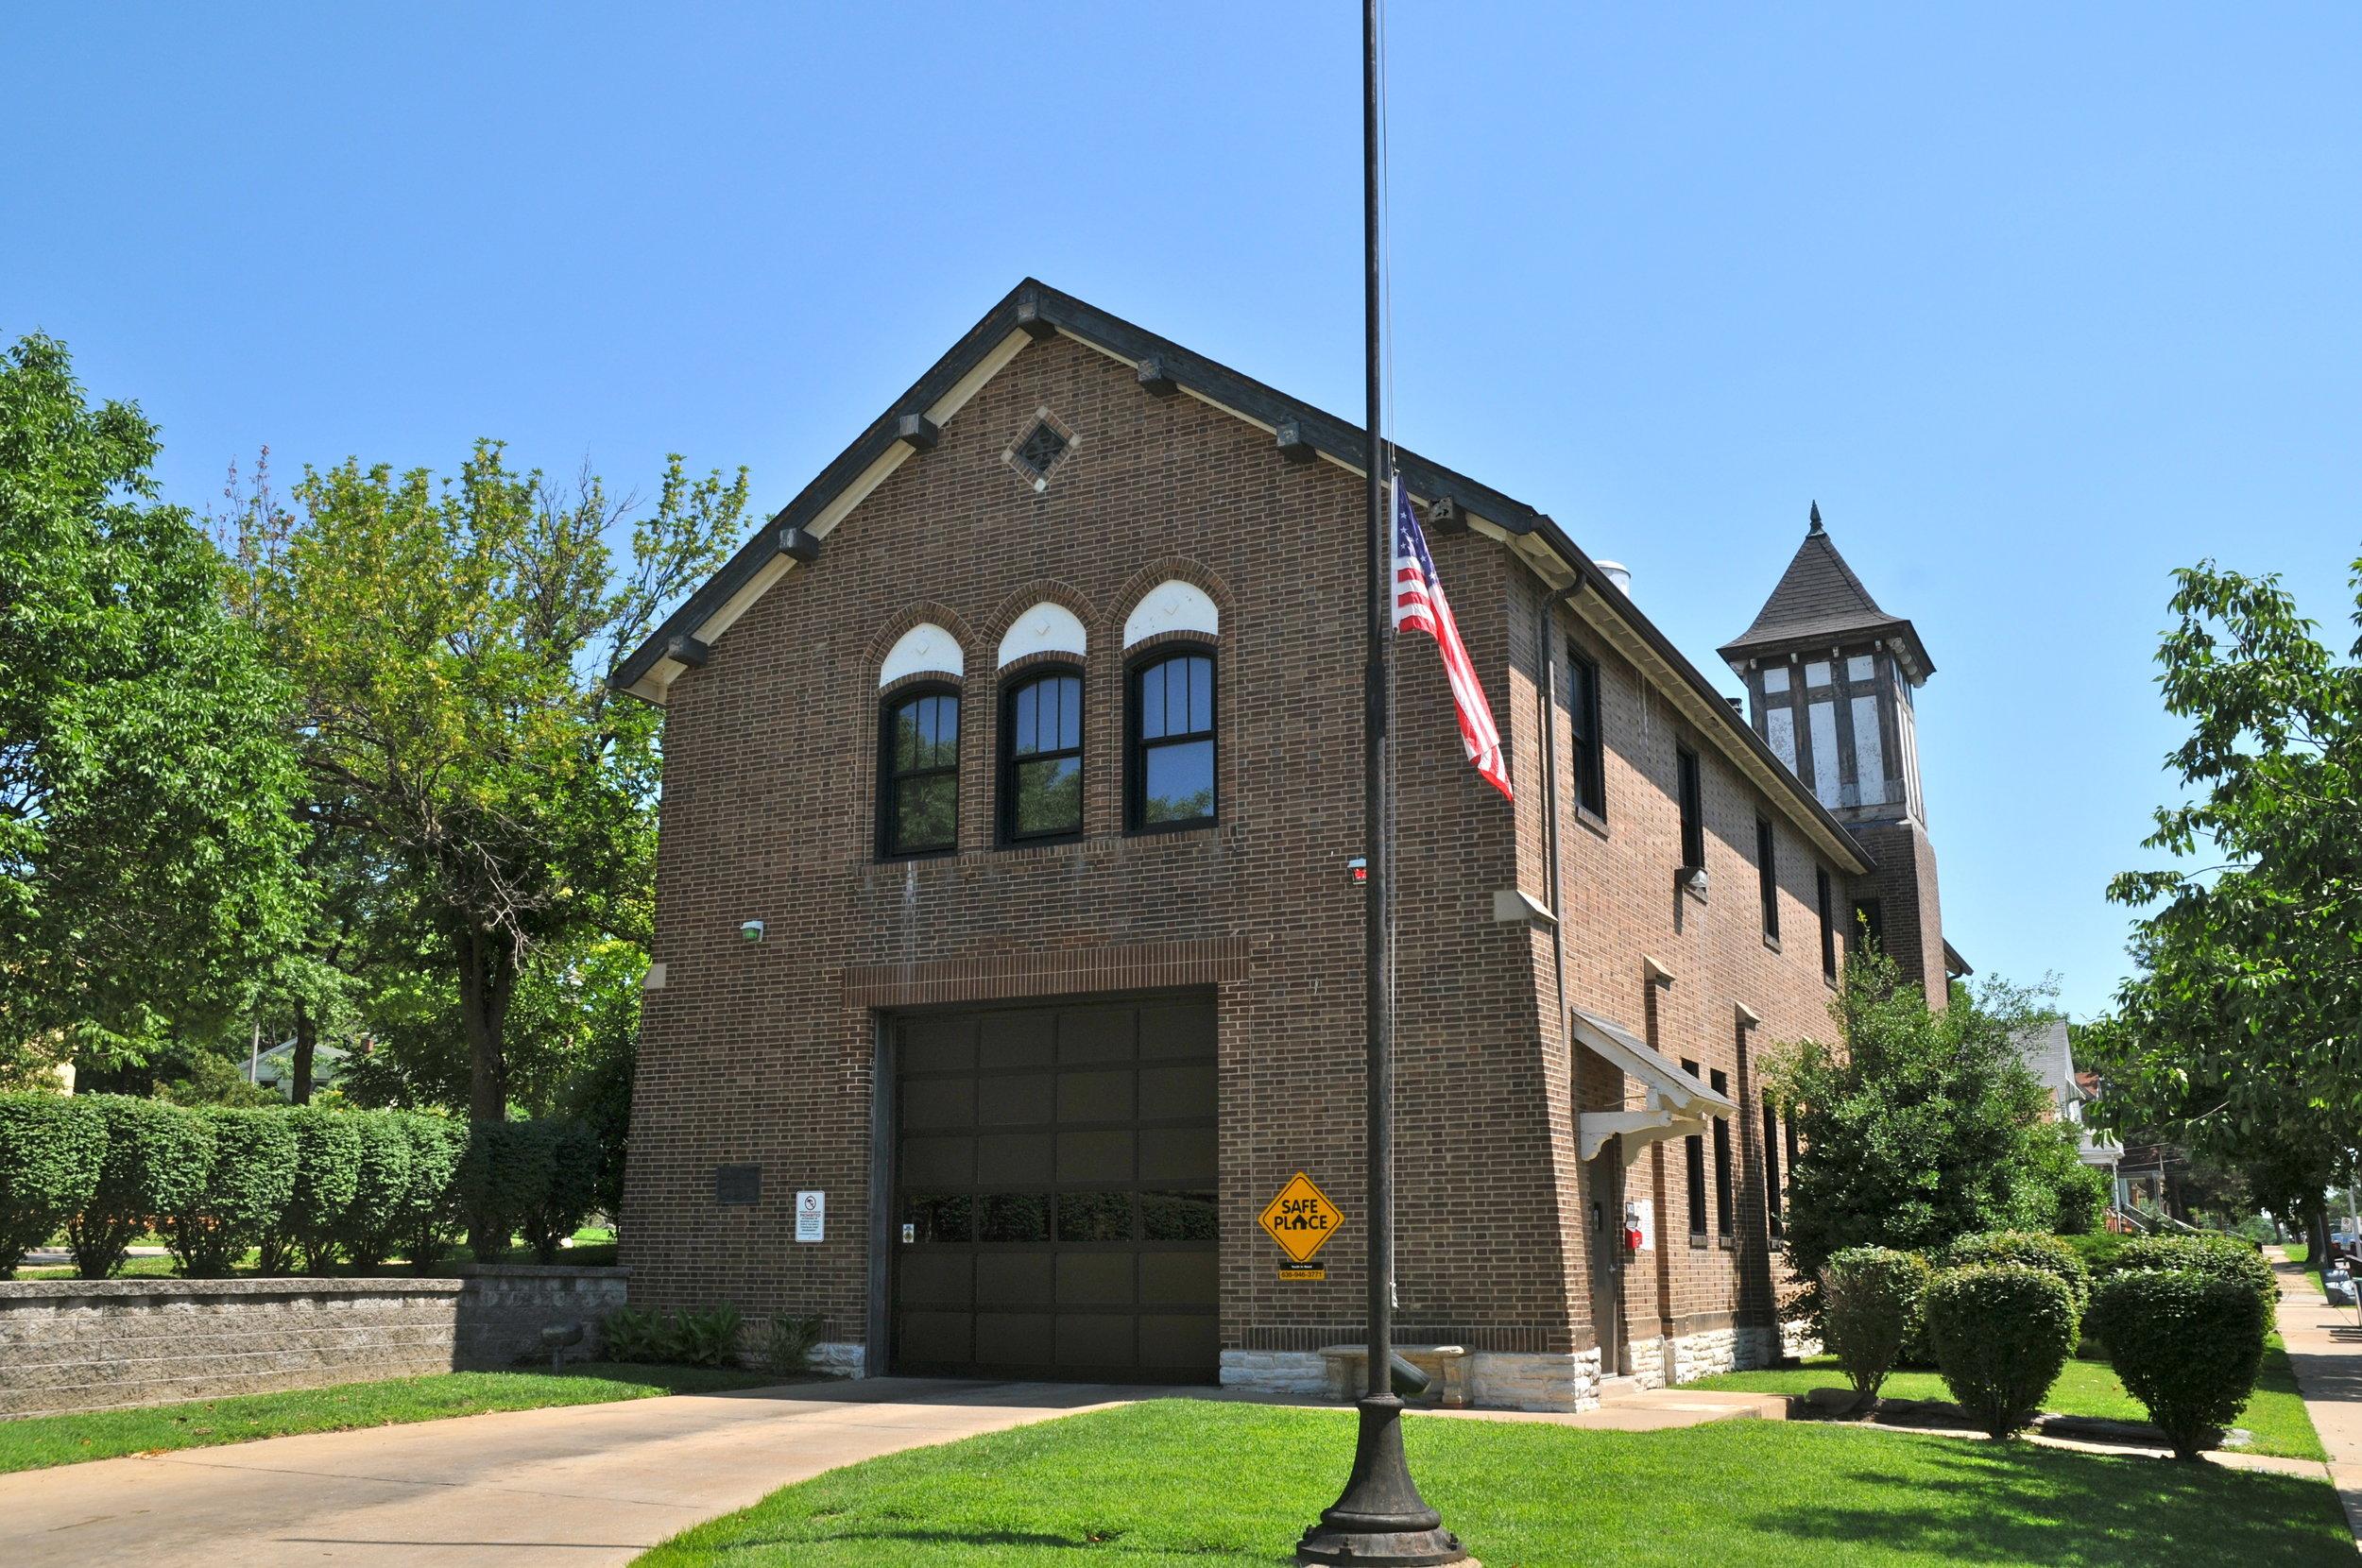 Firehouse #27 - Walnut Park East